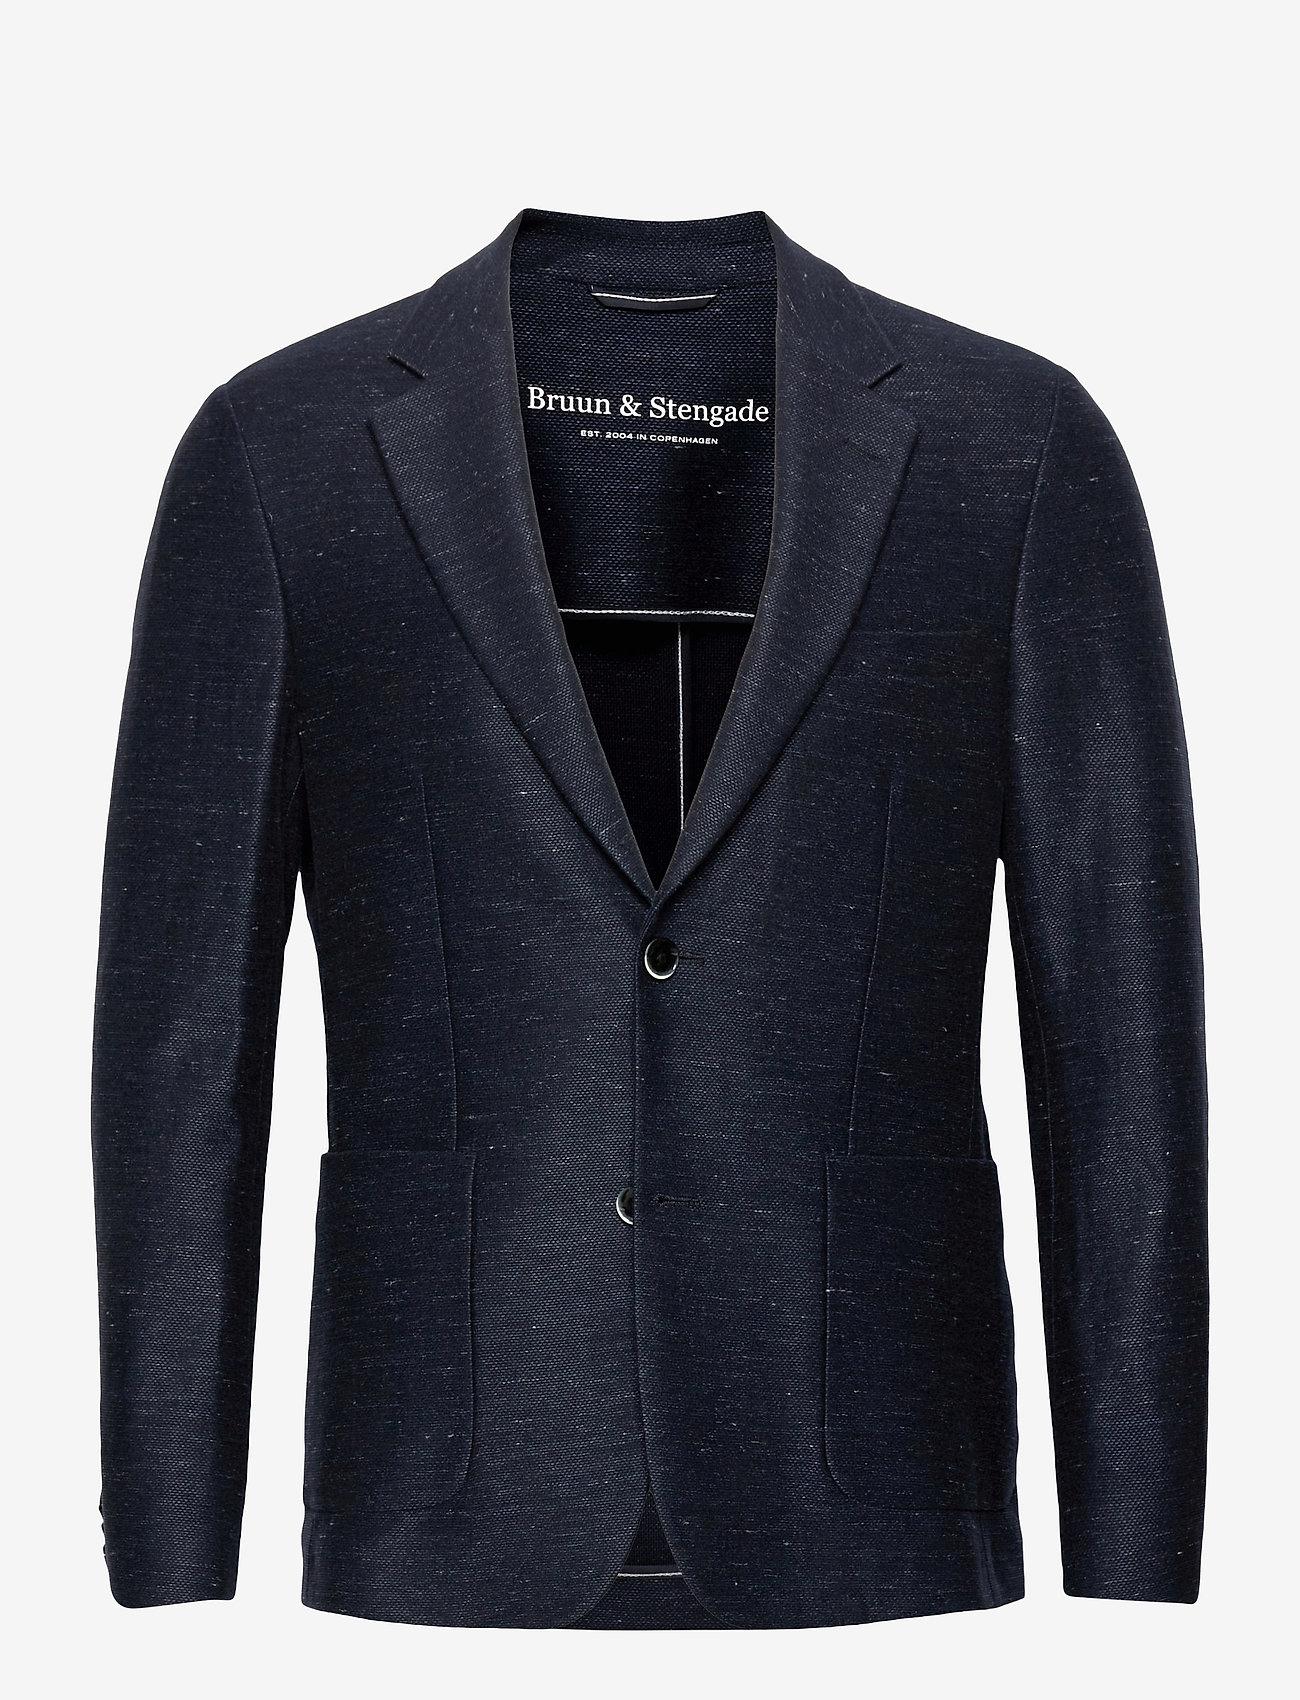 Bruun & Stengade - BS Barbaresco Tailored, Blazer - single breasted blazers - navy - 0